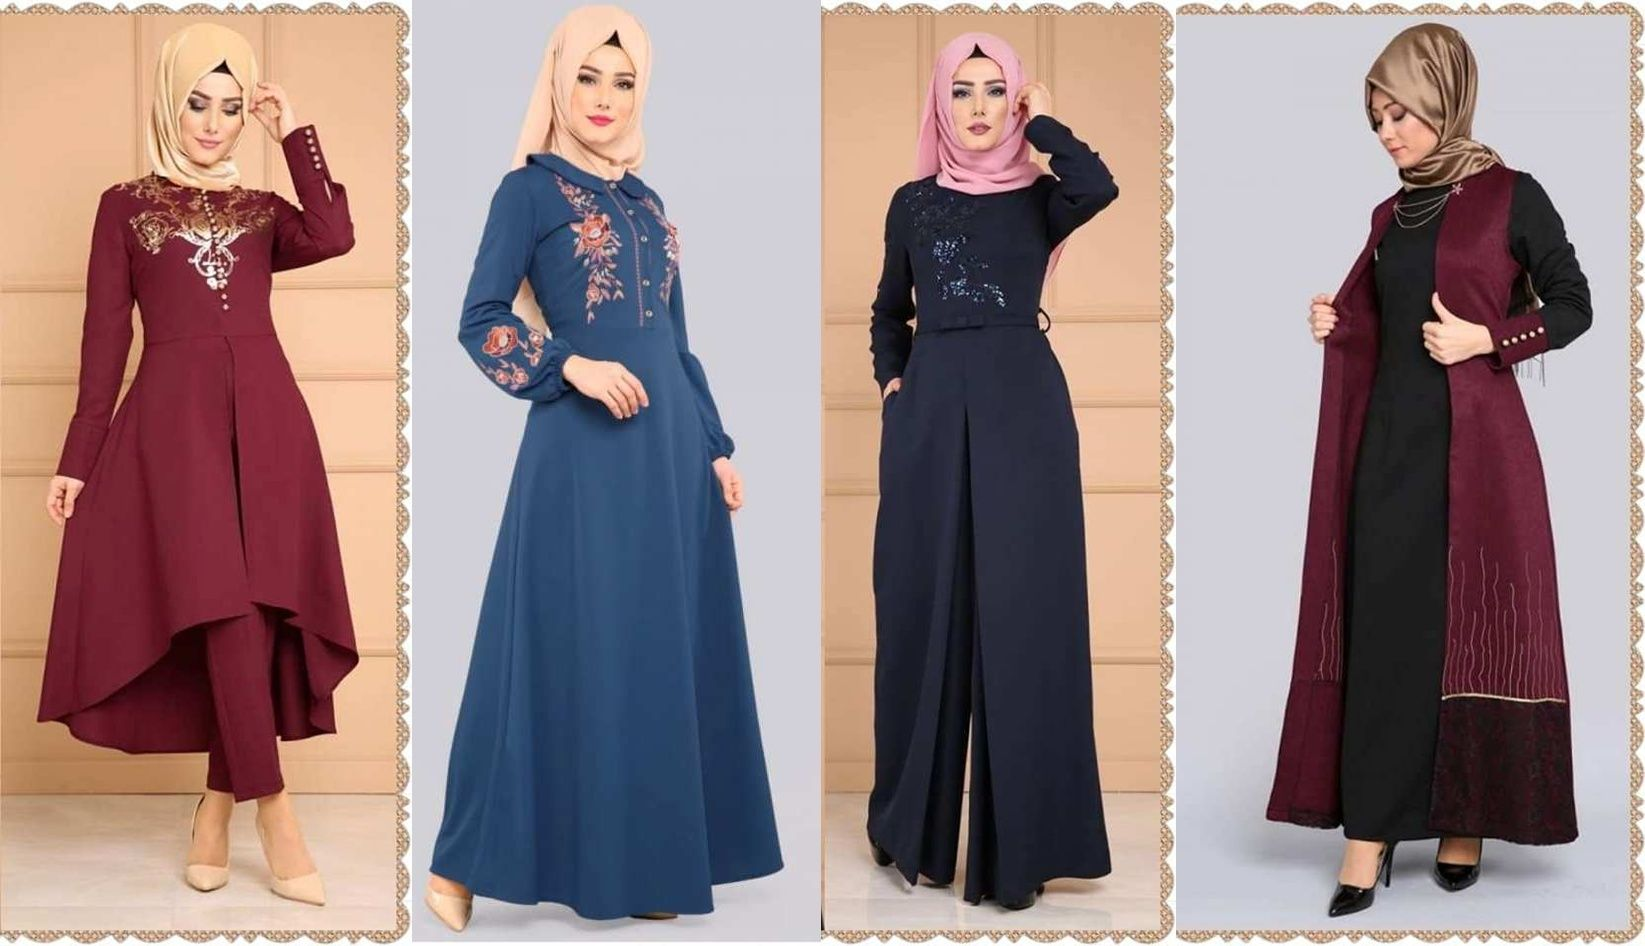 بالصور موديلات حجابات تركية , اجمل صور للحجاب التركي 2628 2